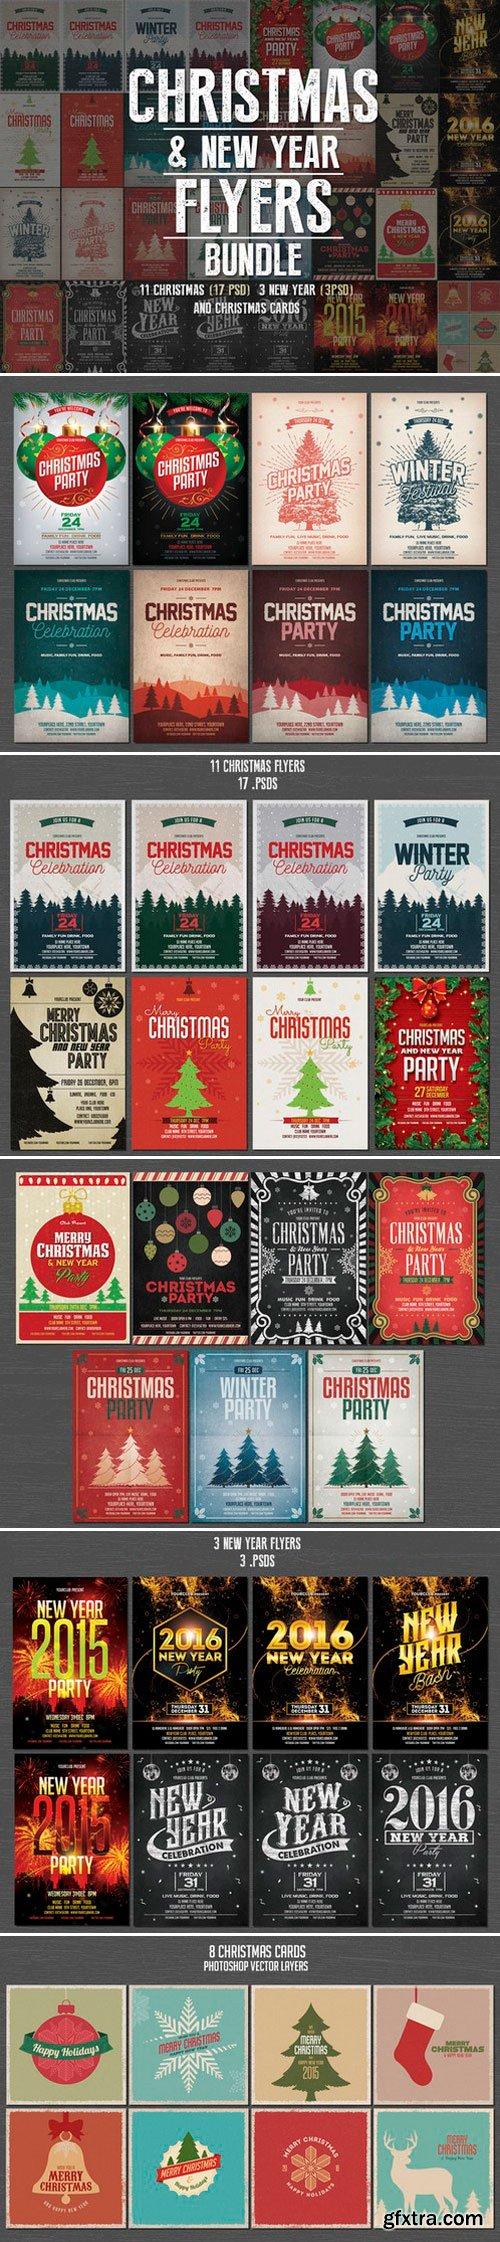 CM - Christmas & New Year Flyers Bundle 453214